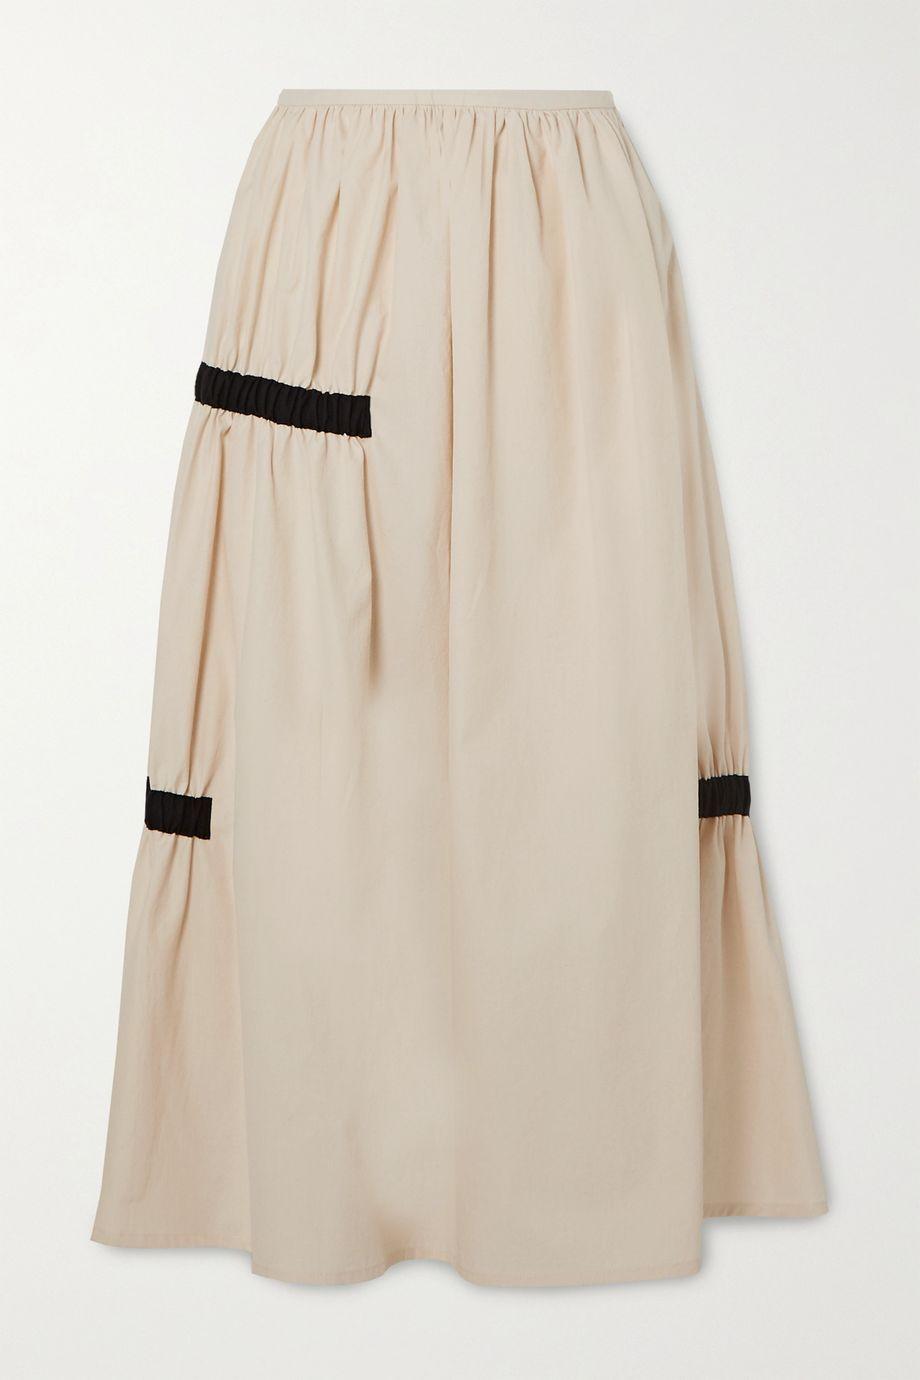 Molly Goddard Grosgrain-trimmed gathered cotton midi skirt